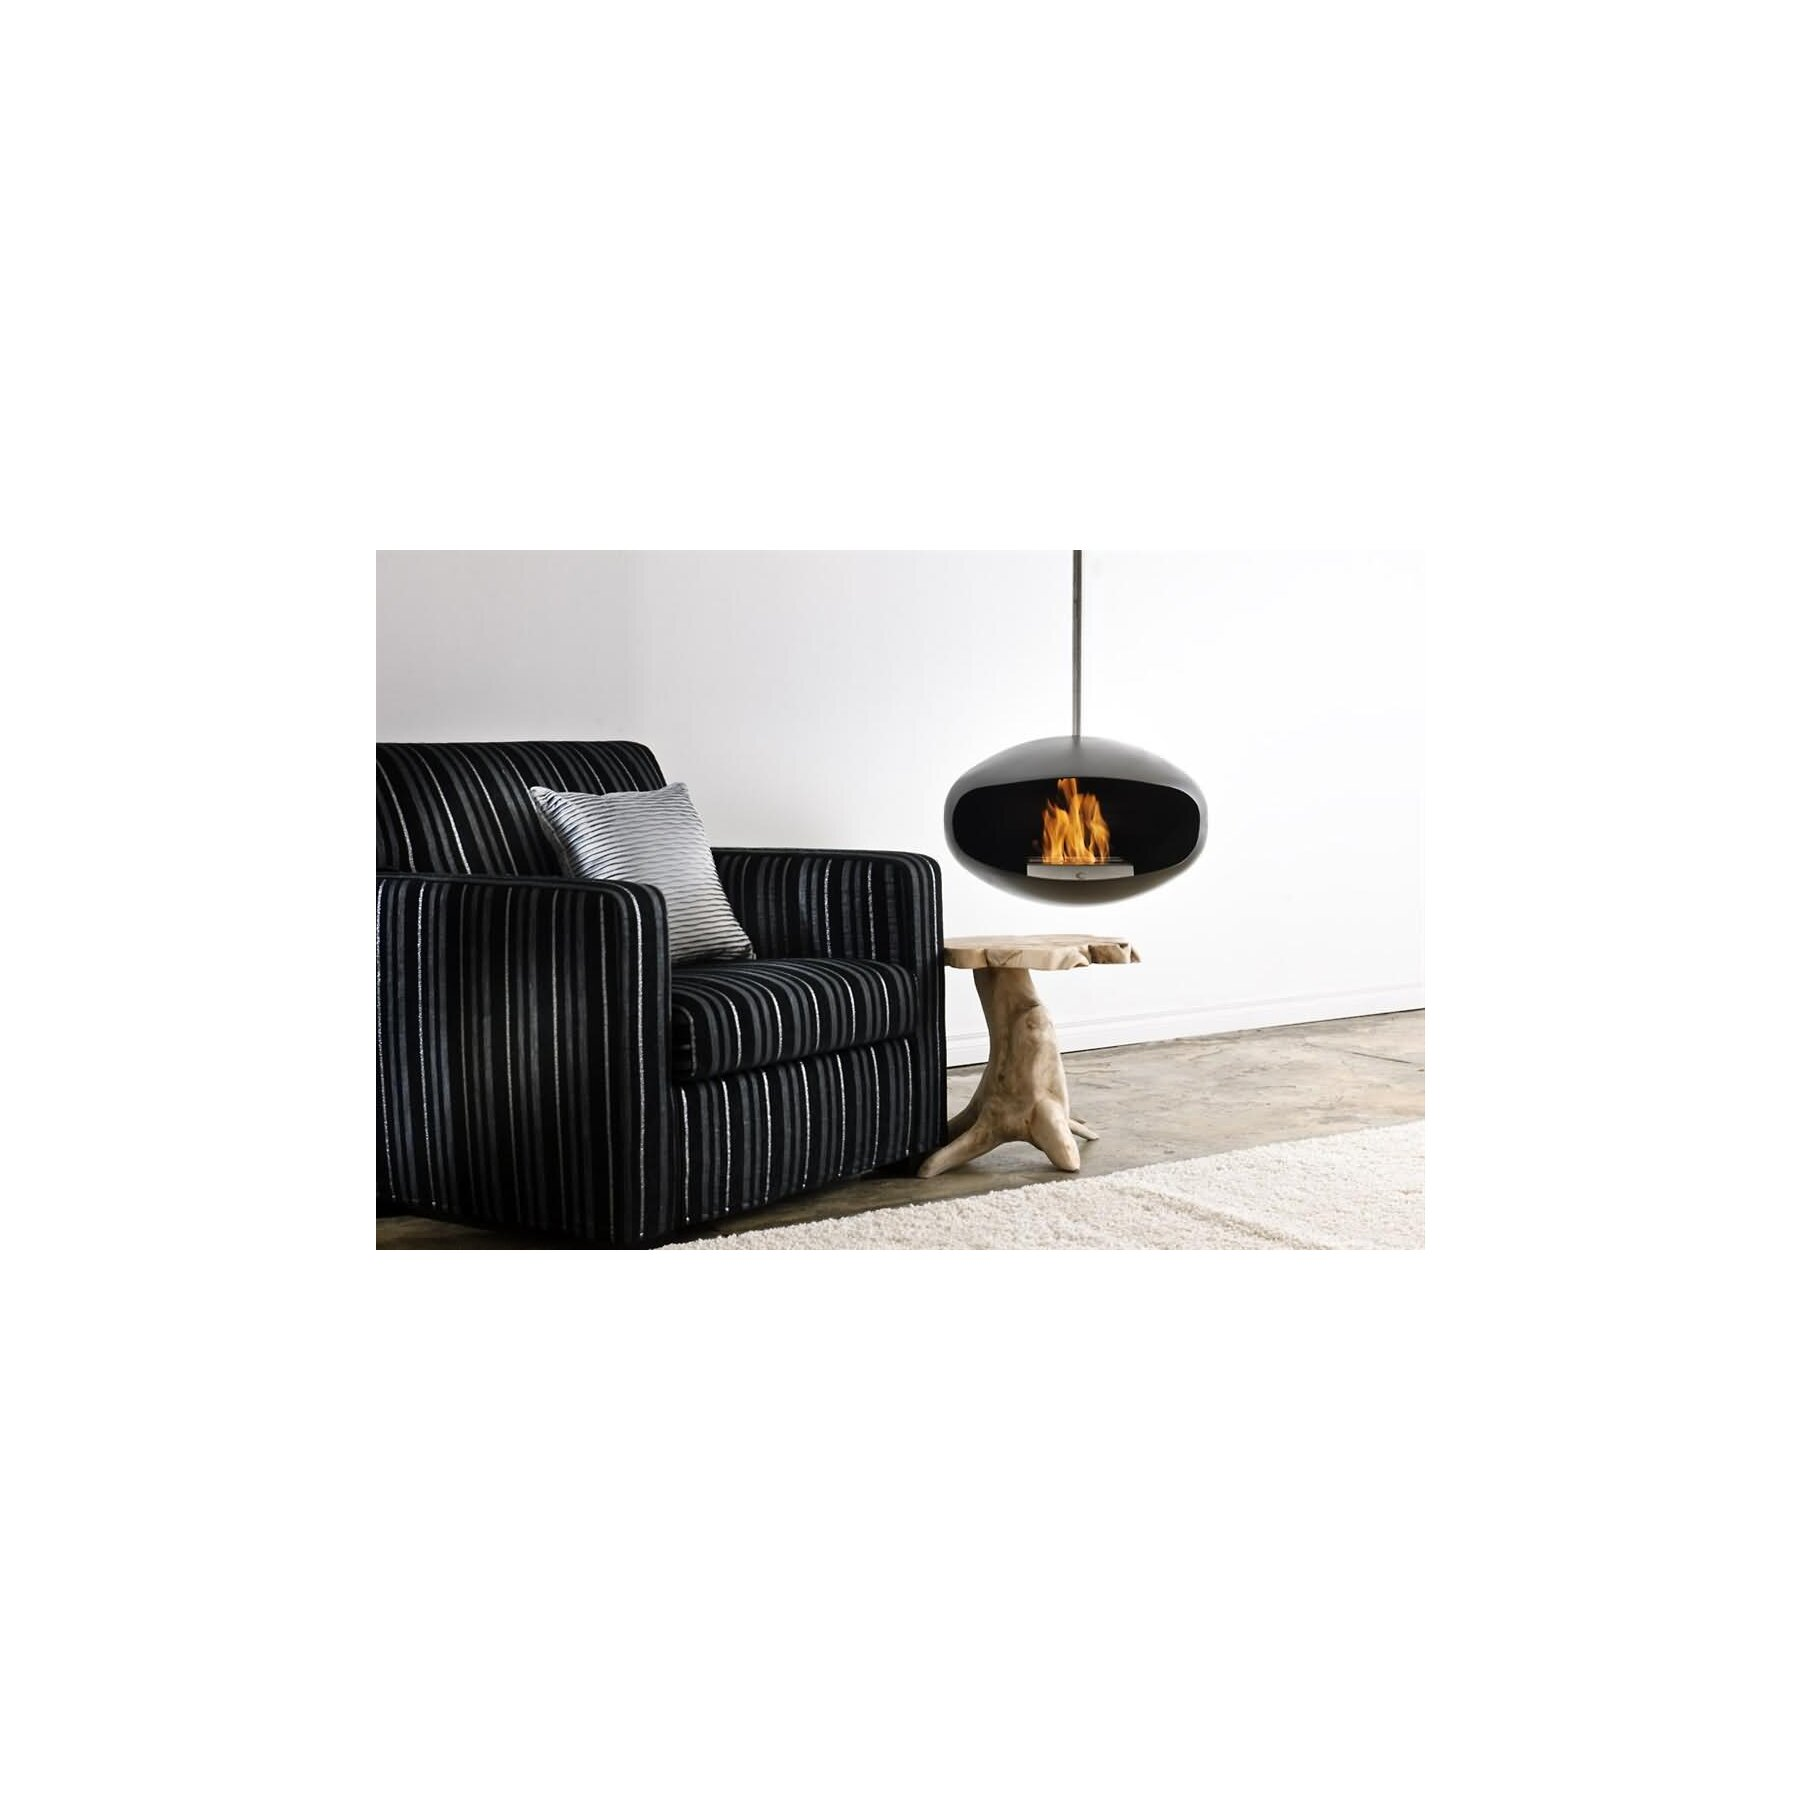 Cocoon Fires Aeris Design Ethanolkamin Hangend